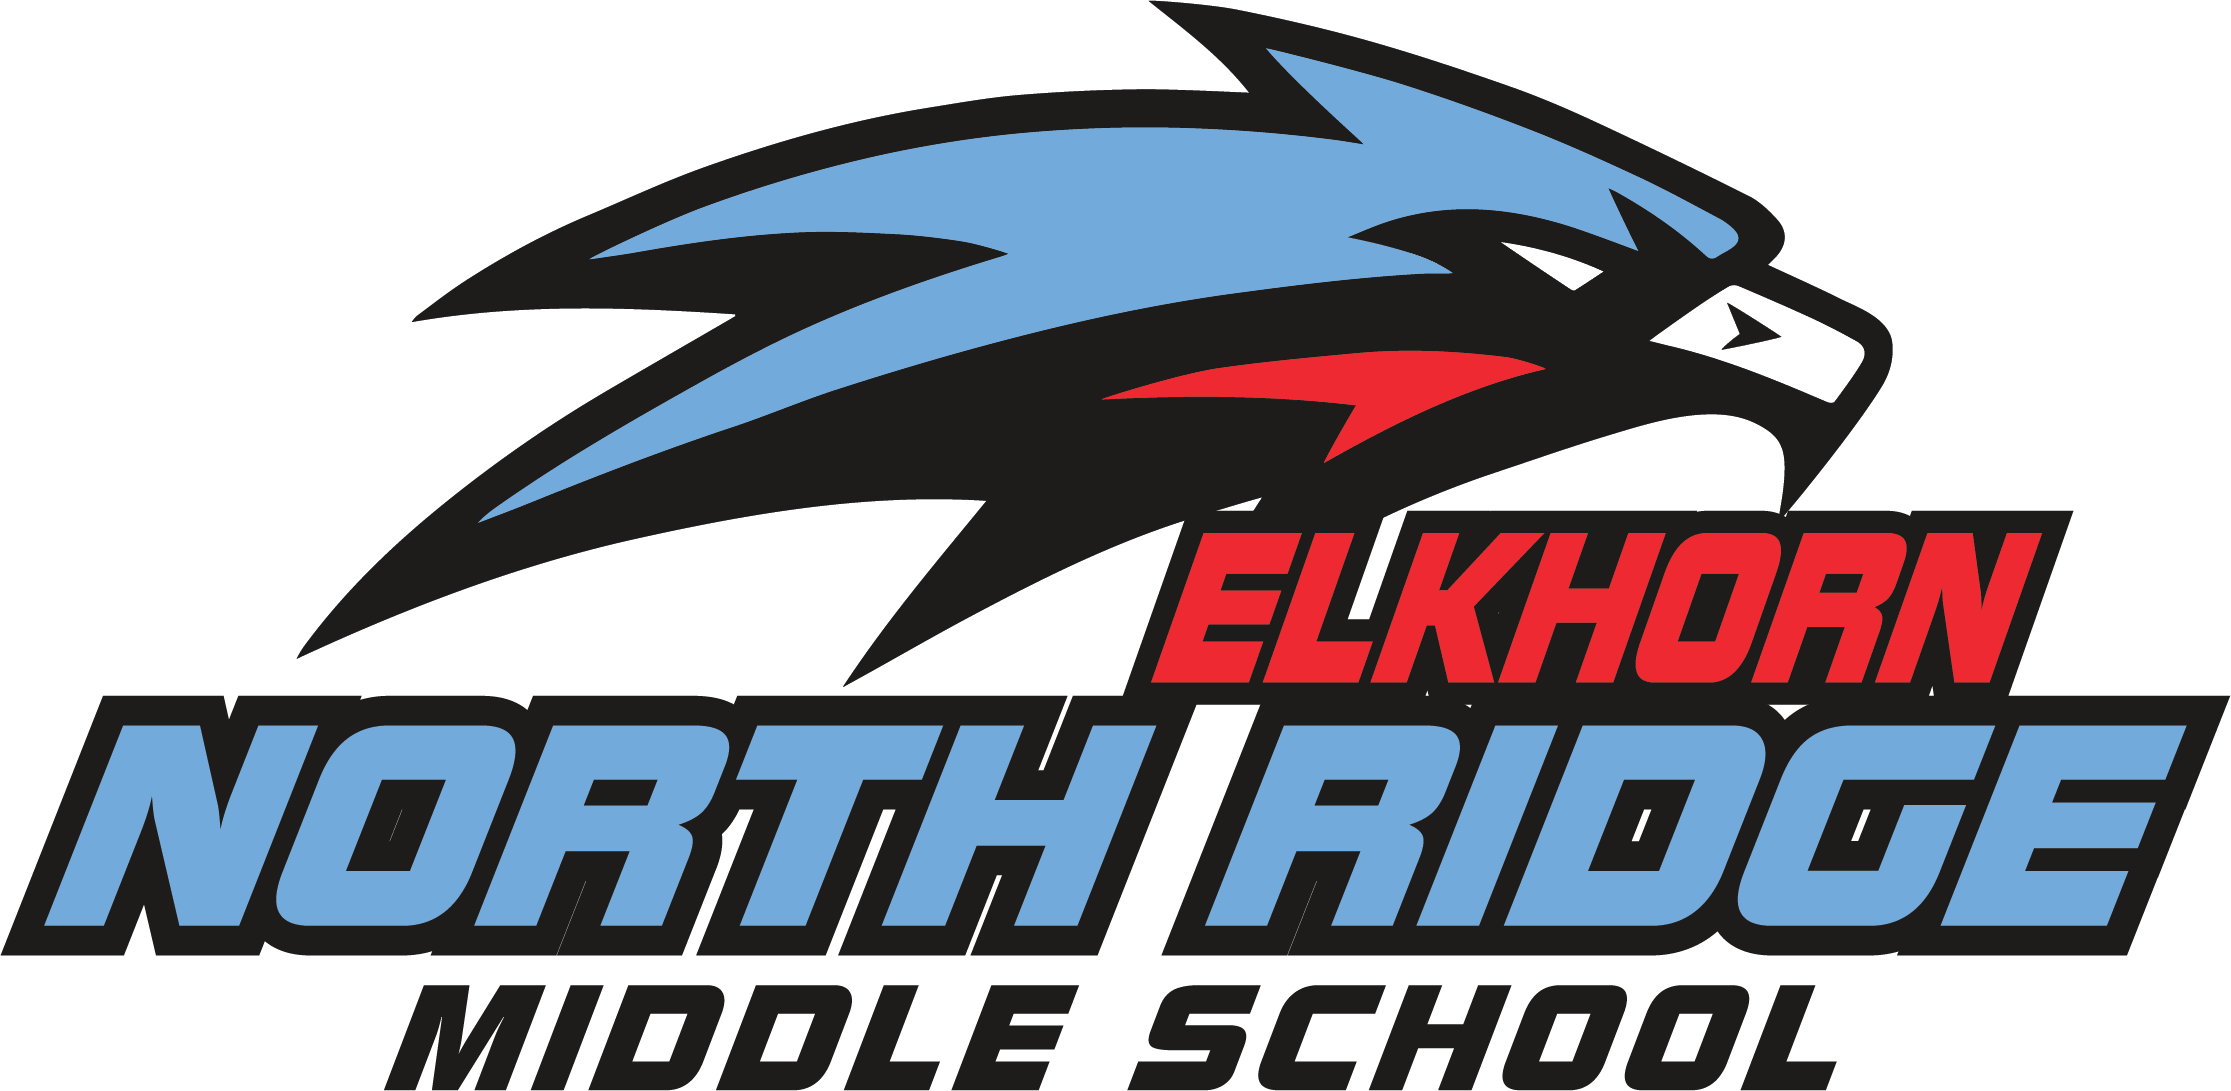 Elkhorn North Ridge Middle School